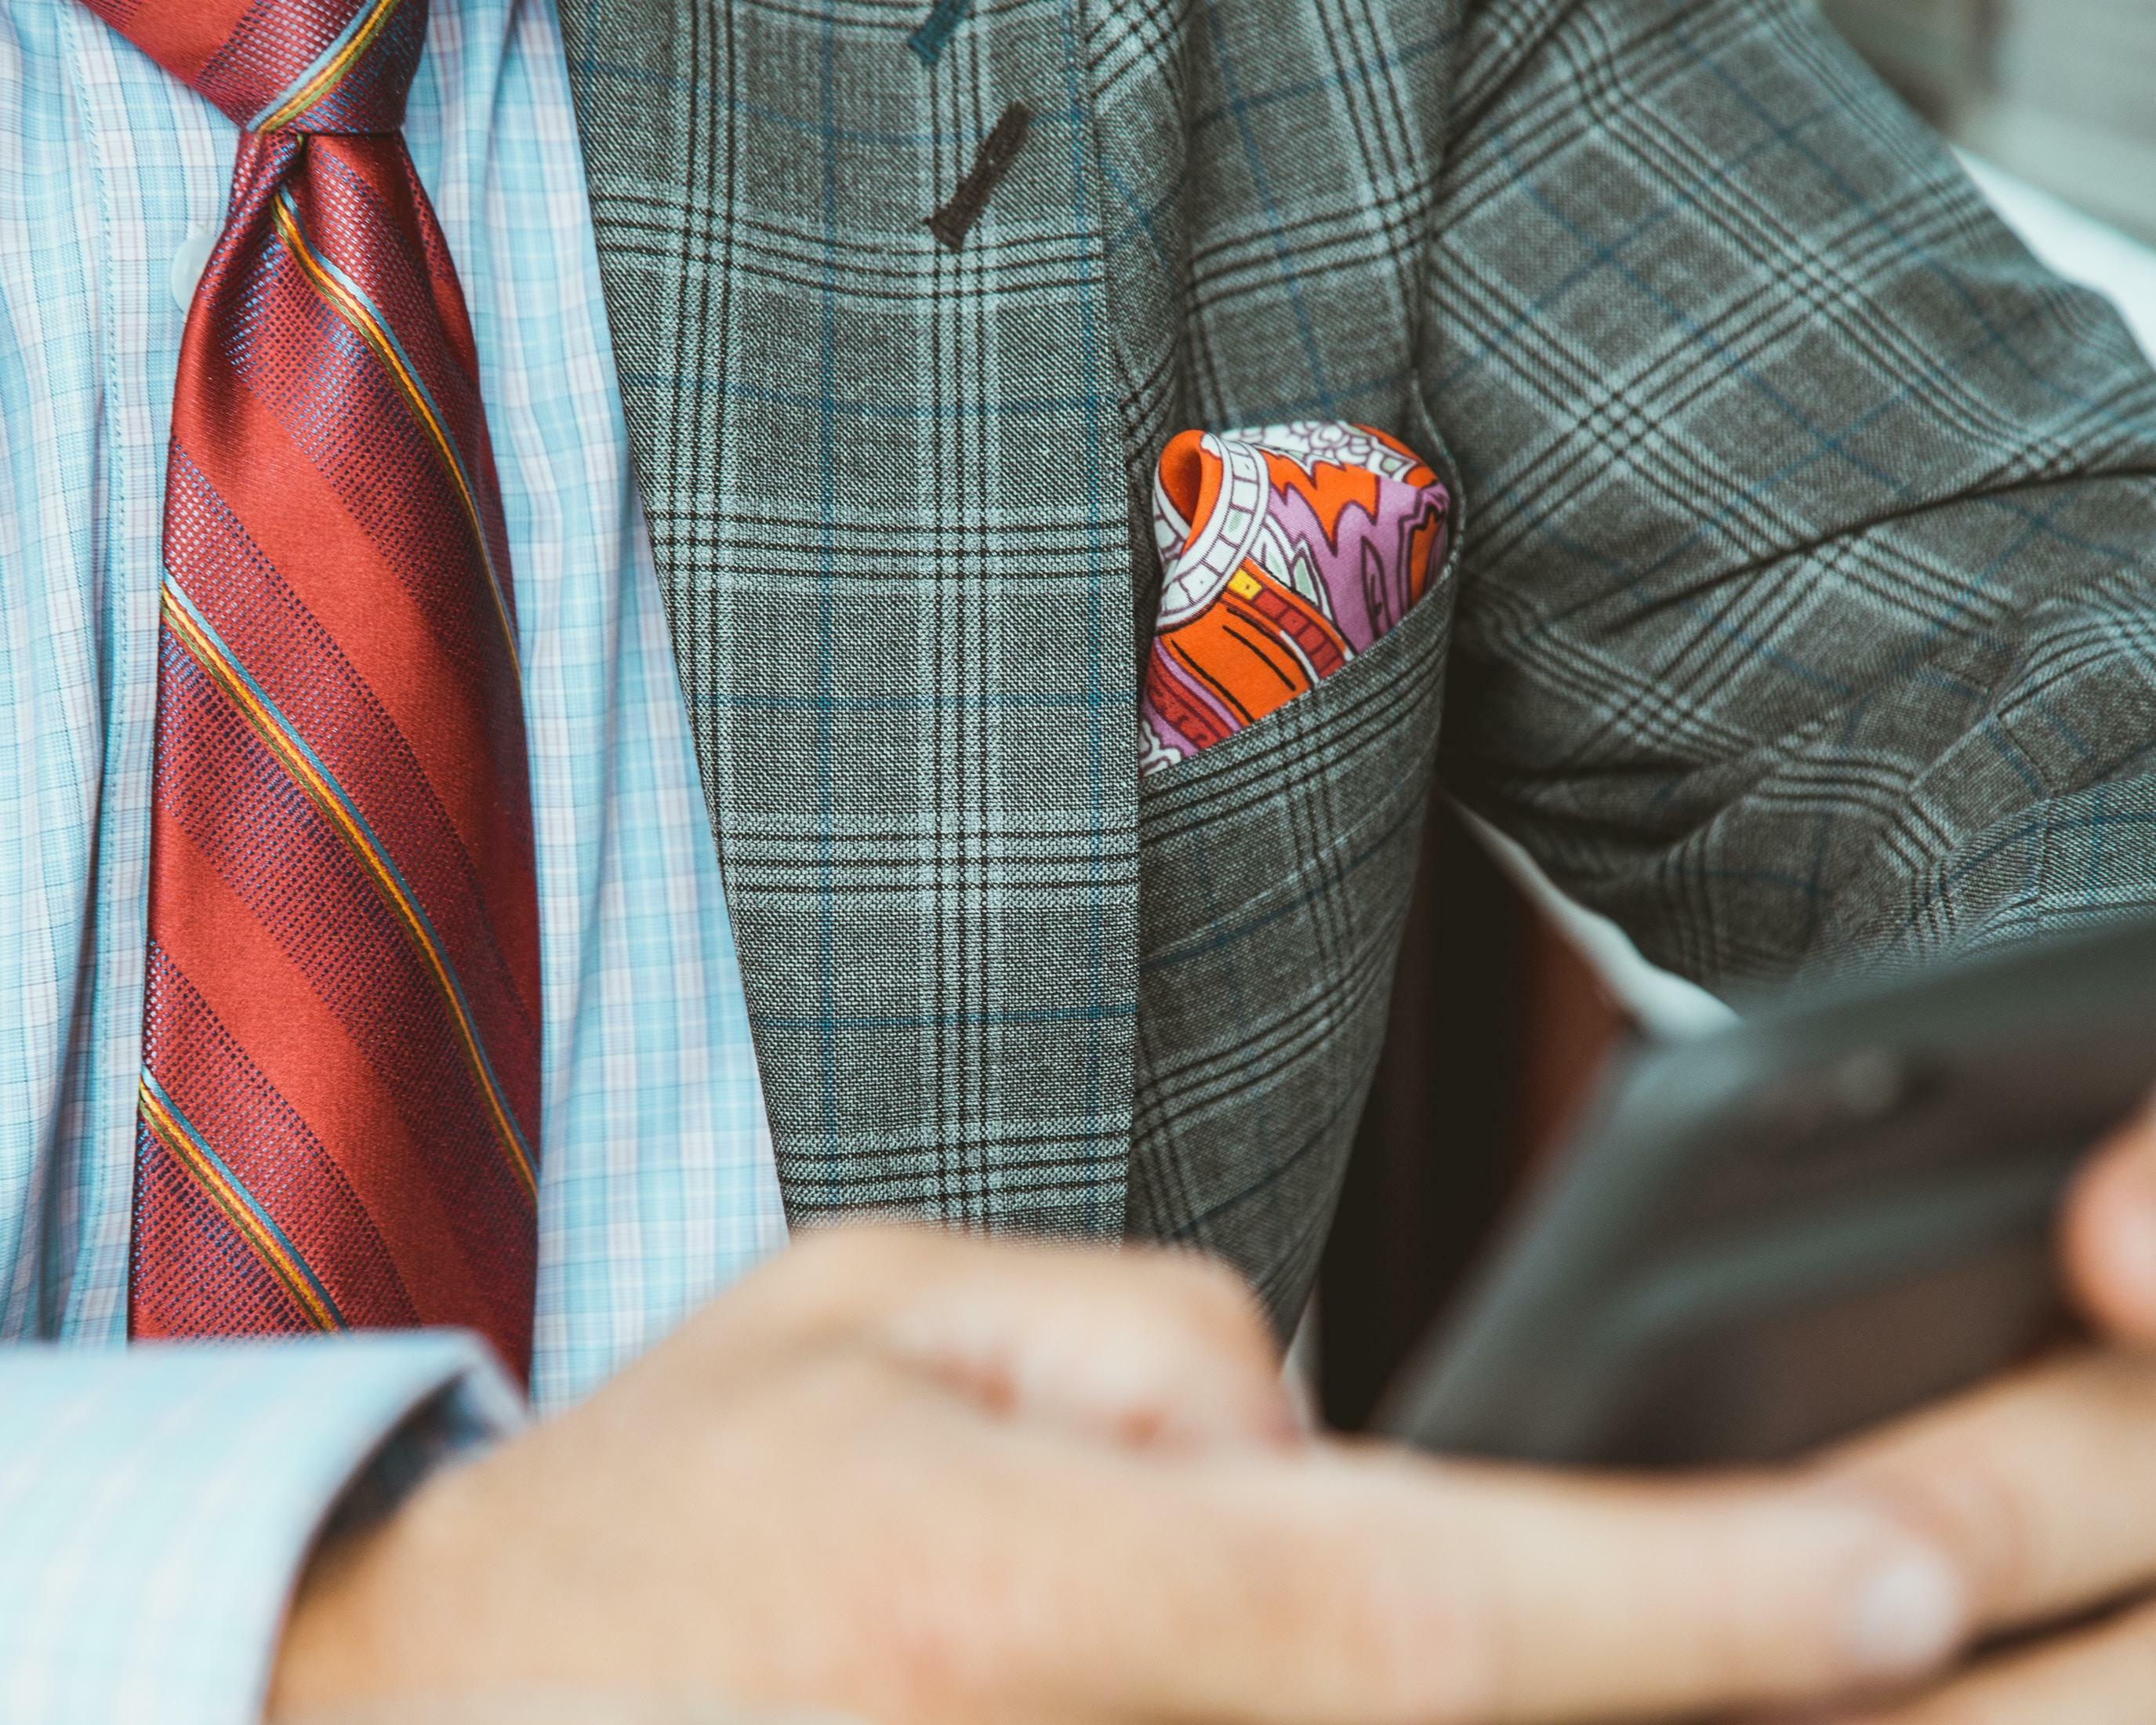 Hemd, Handschlag, Handy: Drei eherne Aspekte des Büro-Benimms